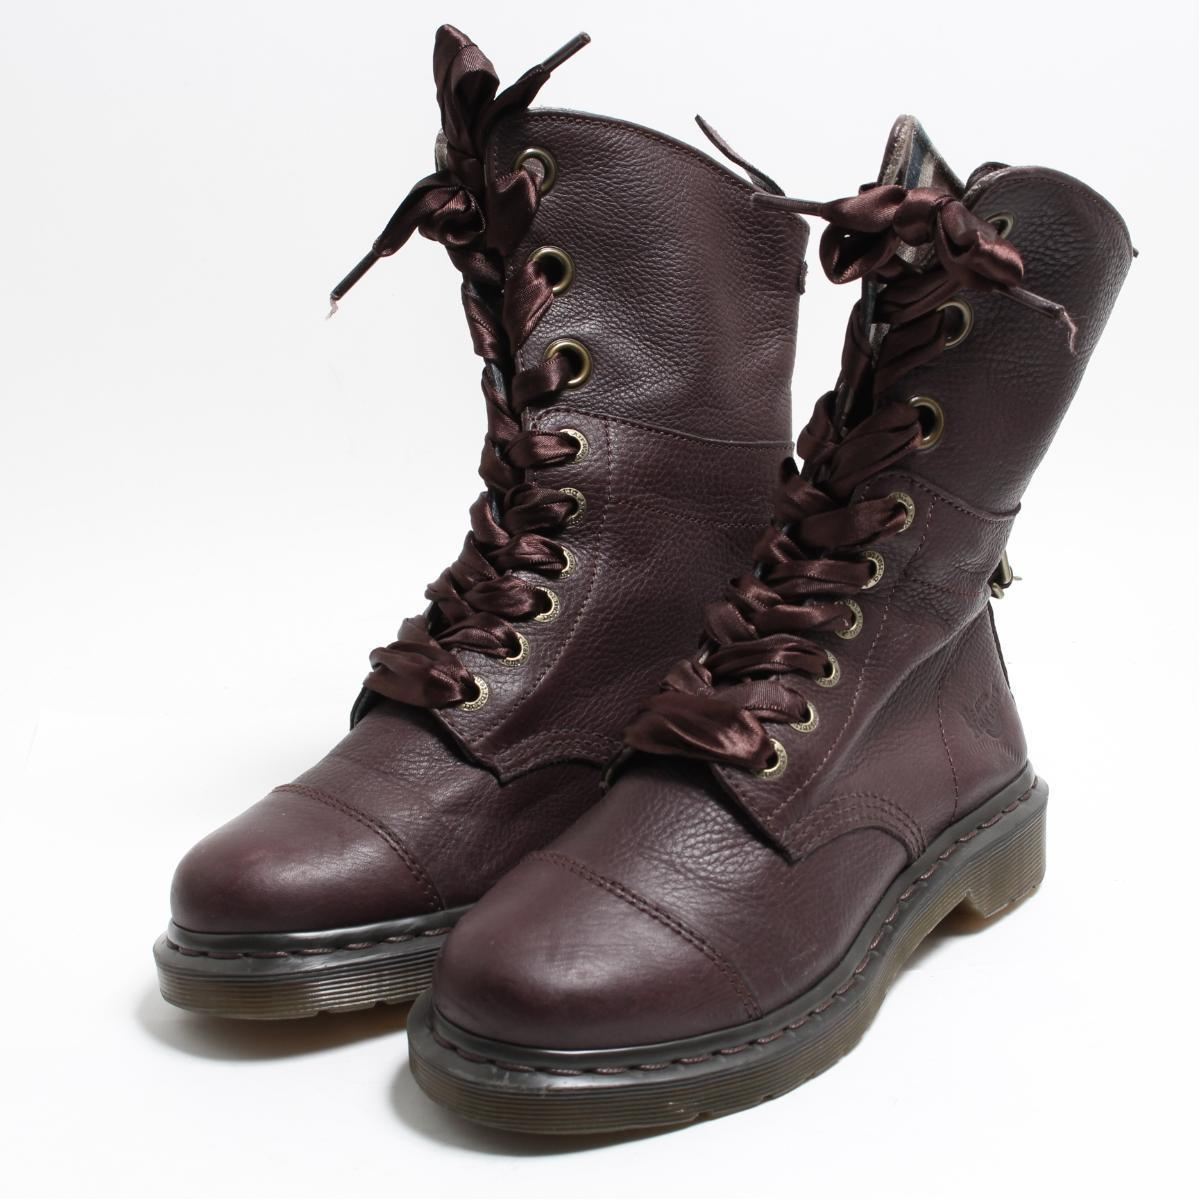 2a882bfc48b Doctor Martin Dr.Martens AIMILITA roll top 9 hall boots UK5 Lady's 23.5cm  /bon1969